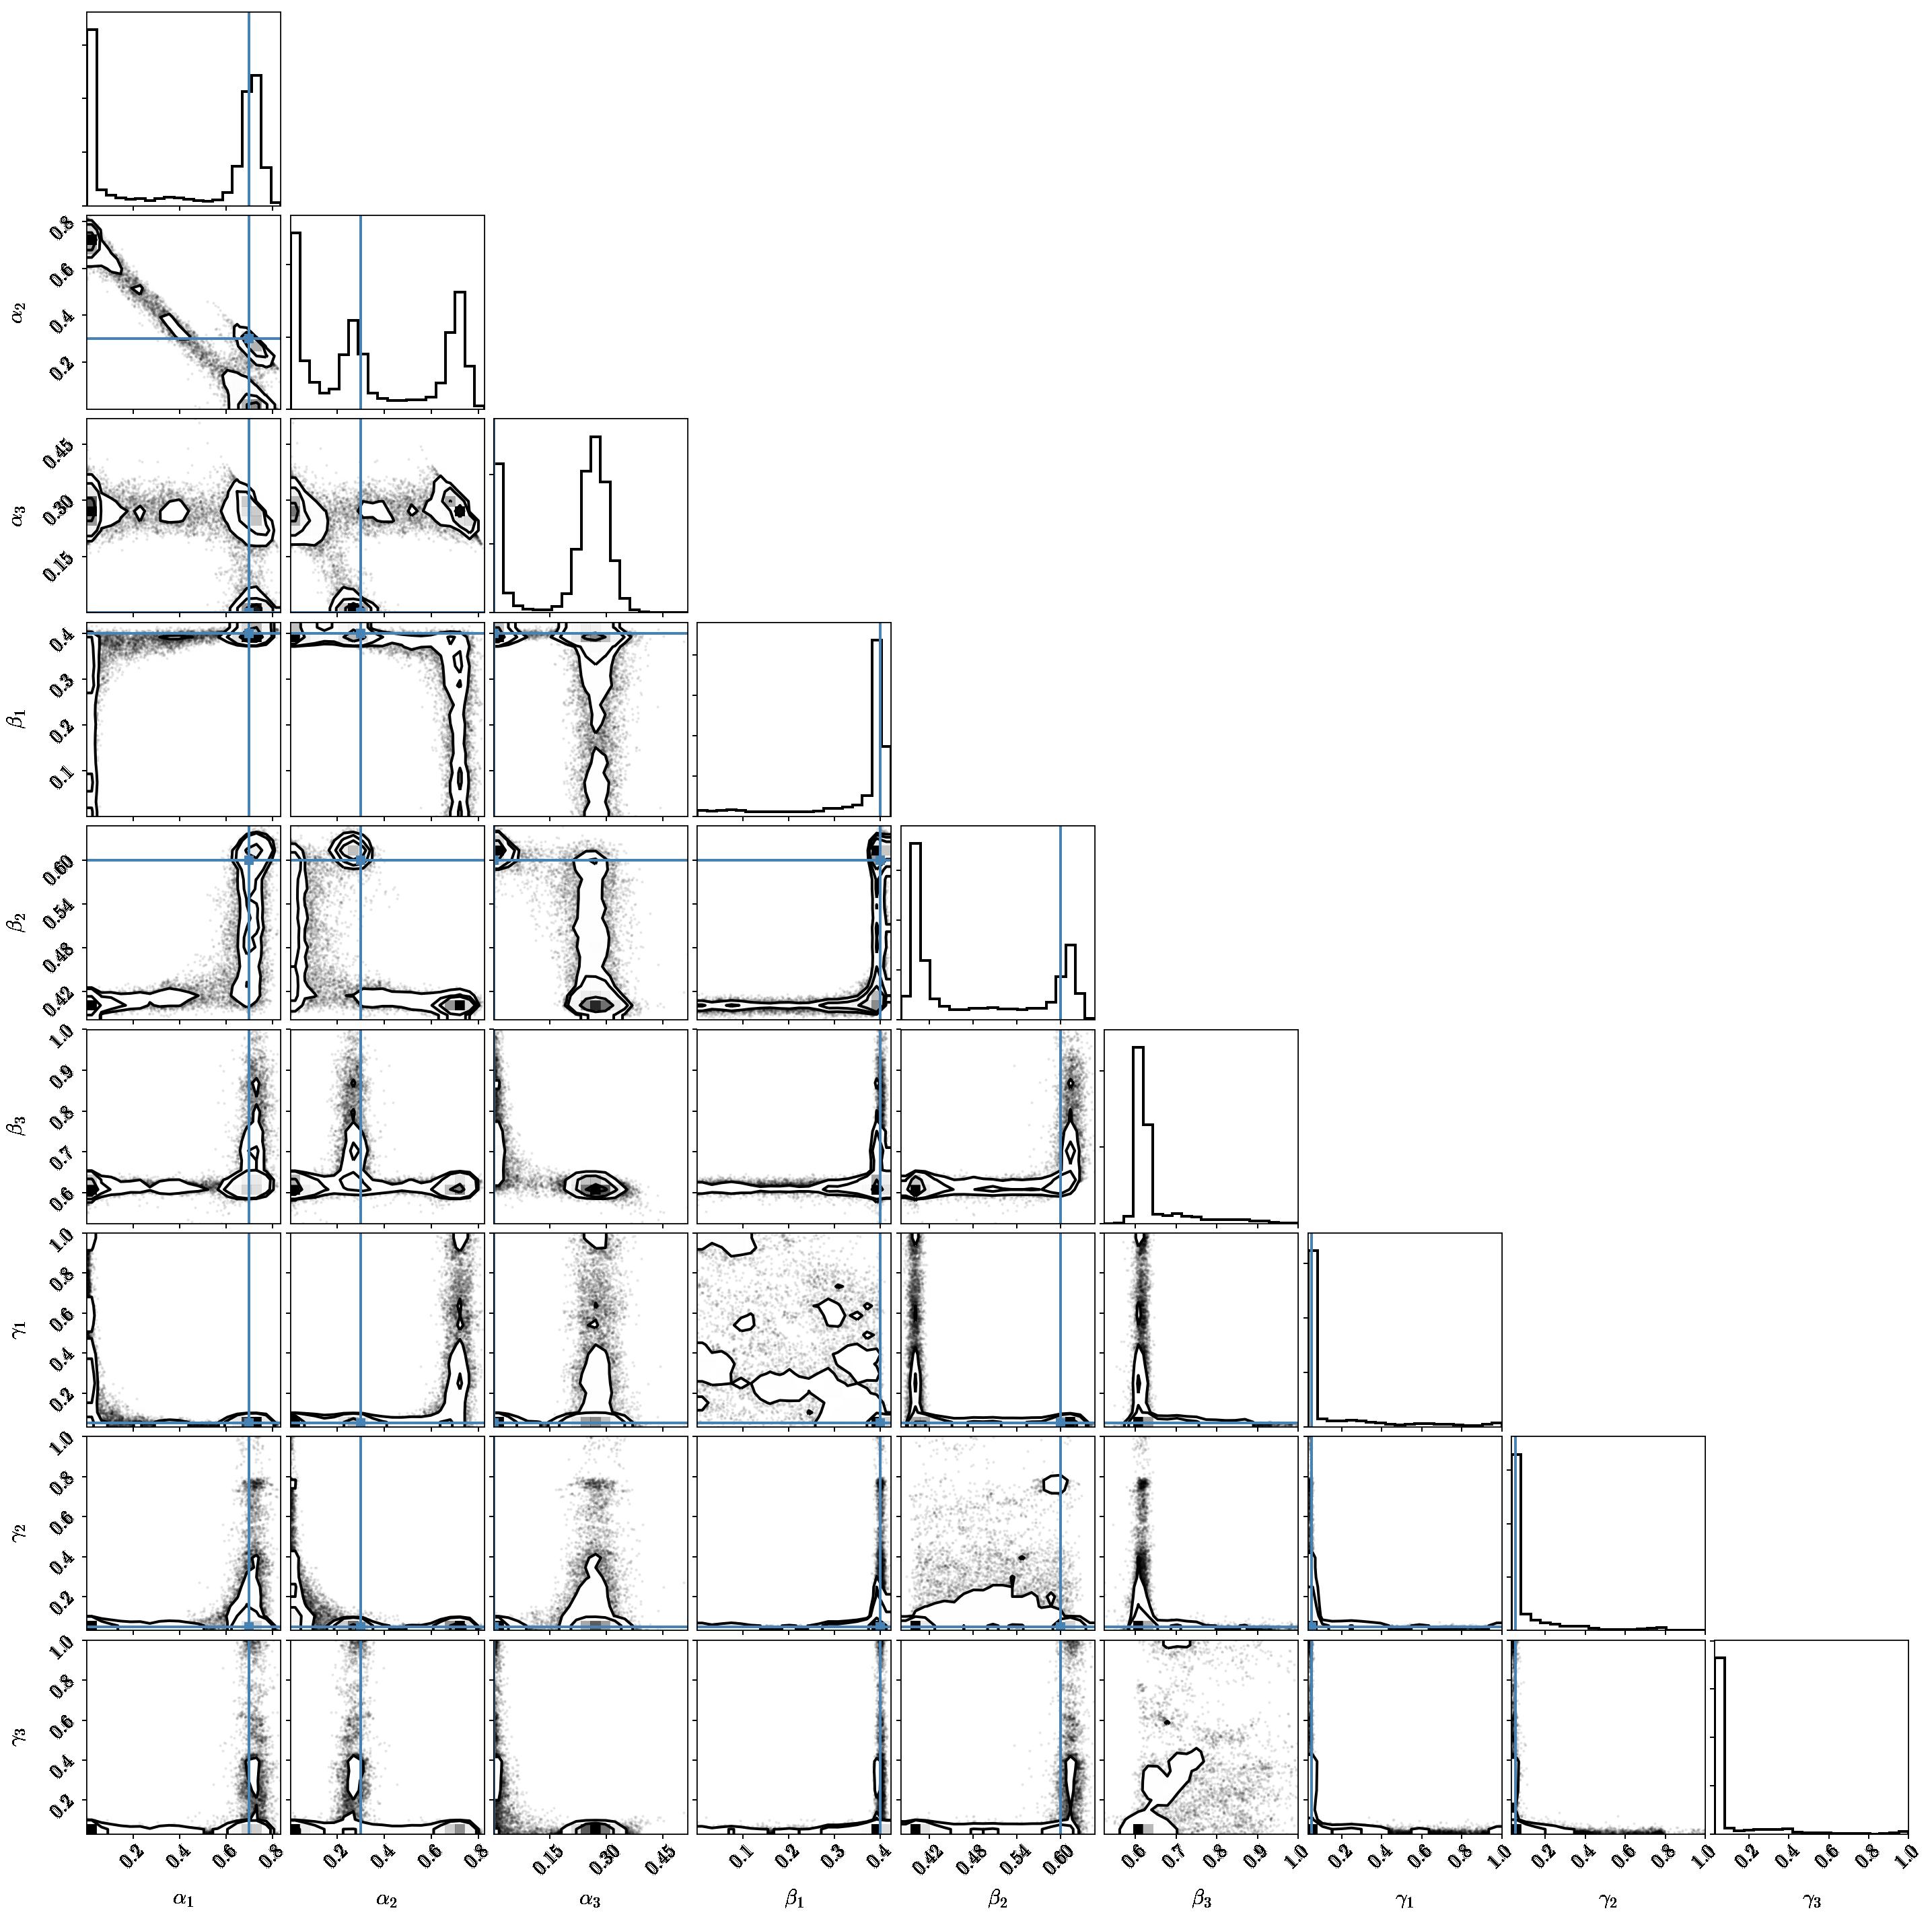 Efficiently sampling mixture models - exploration and